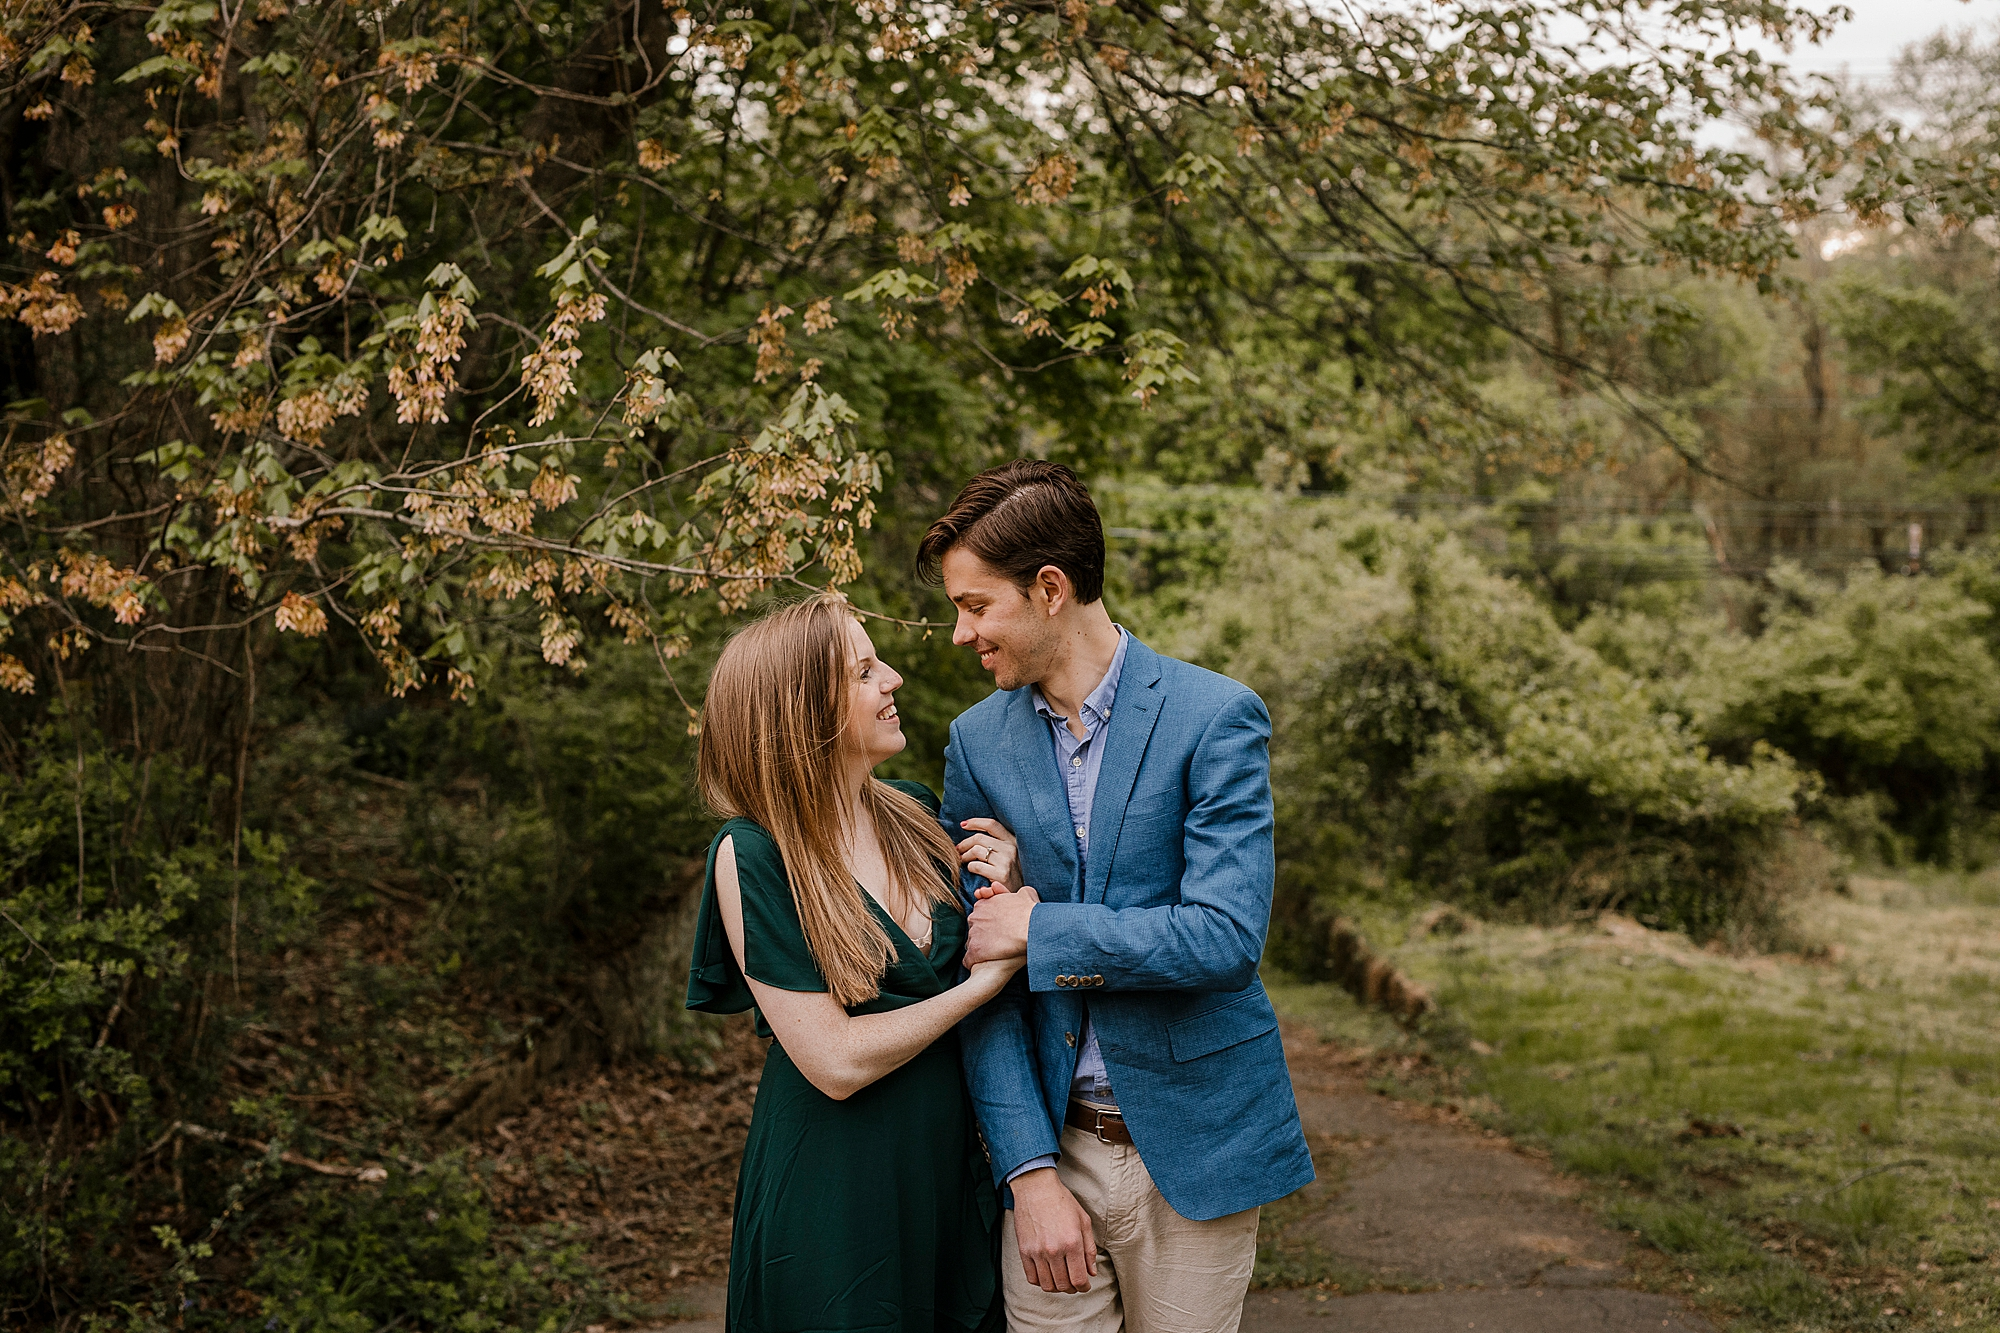 Tori_Zack_Glen_Mills_Terrain Cafe_Wedding_Engagement_Photography_Joe_Mac_Creative__0035.jpg